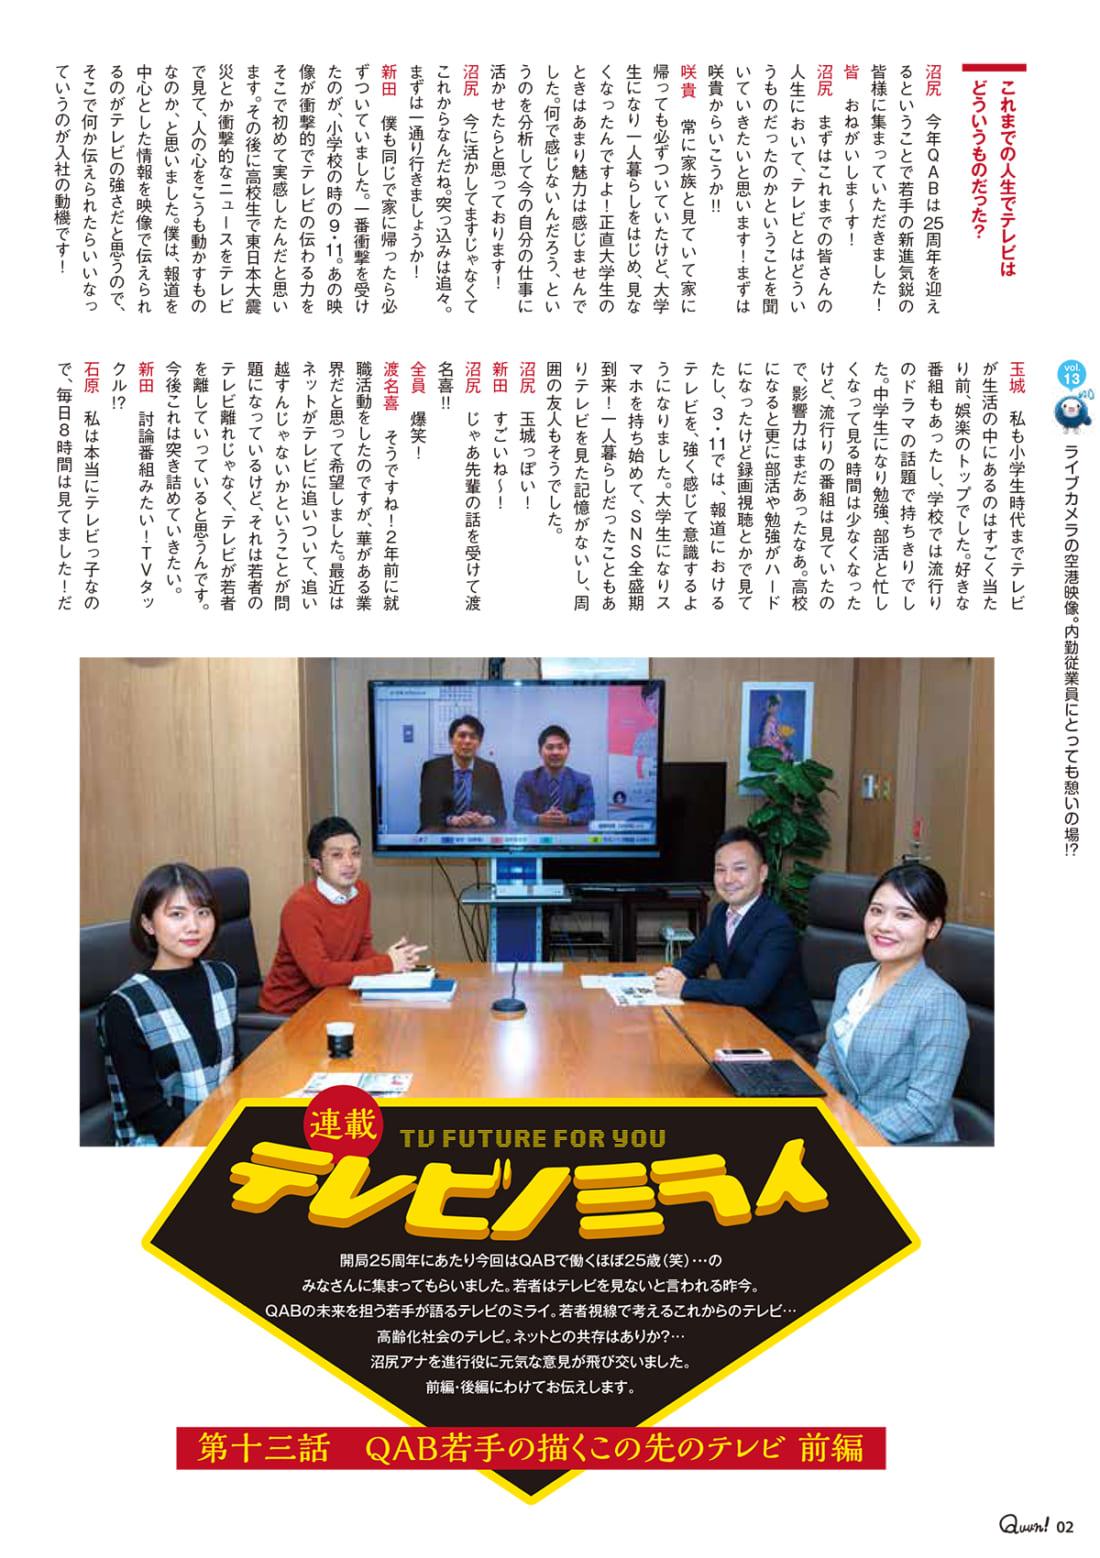 https://www.qab.co.jp/qgoro/wp-content/uploads/quun_1304-1100x1558.jpg